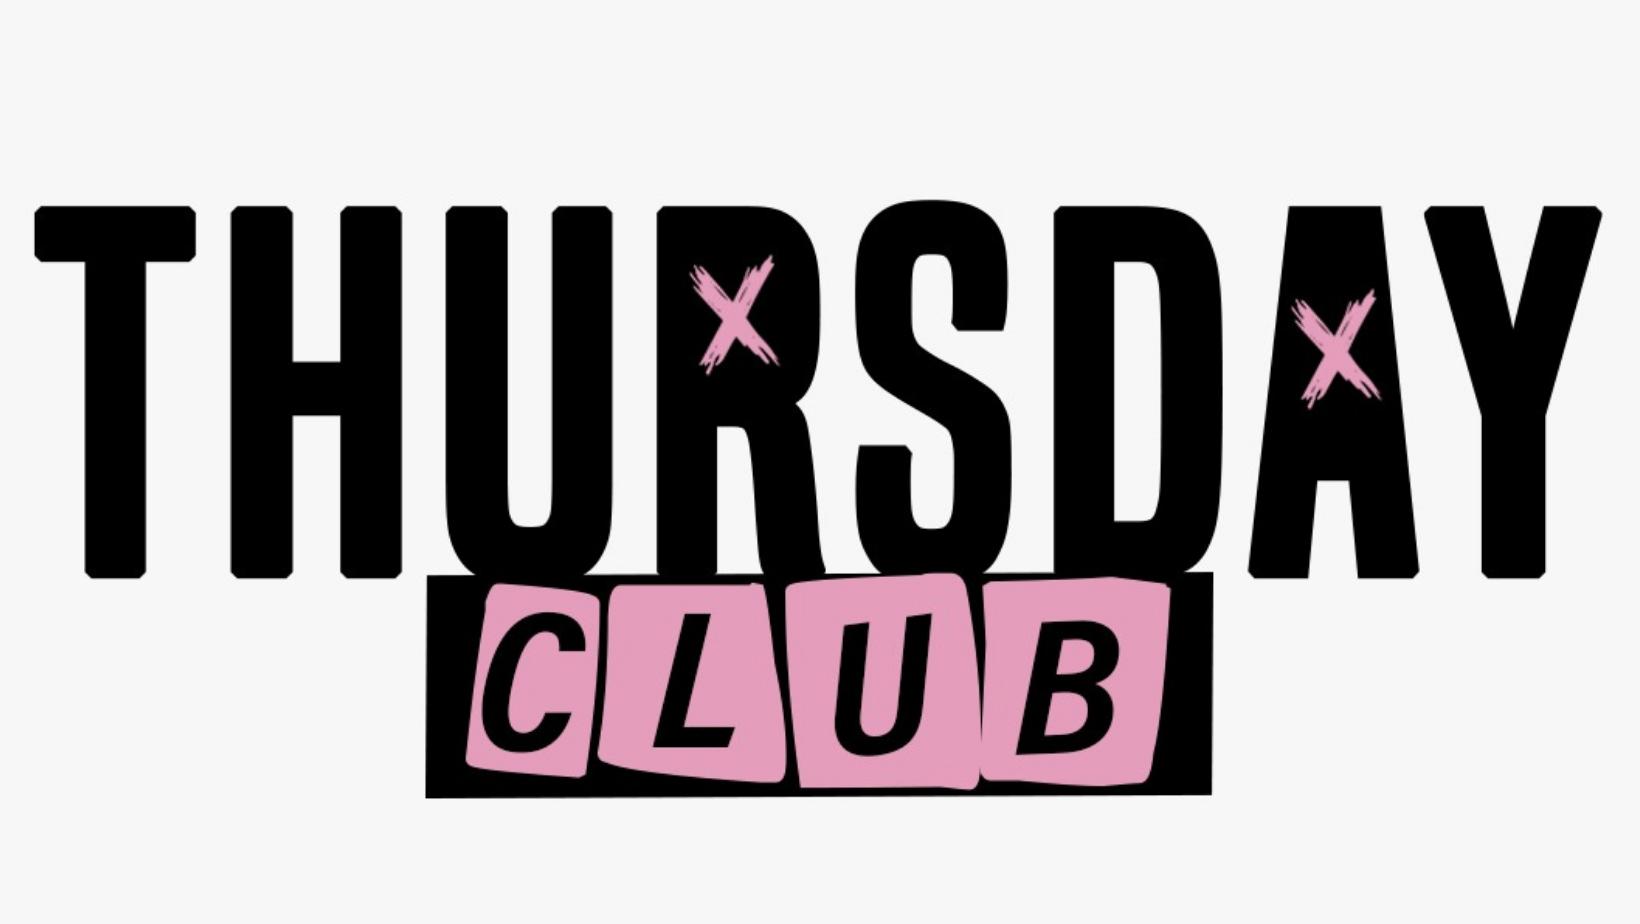 THURSDAY CLUB - CLUBLIV